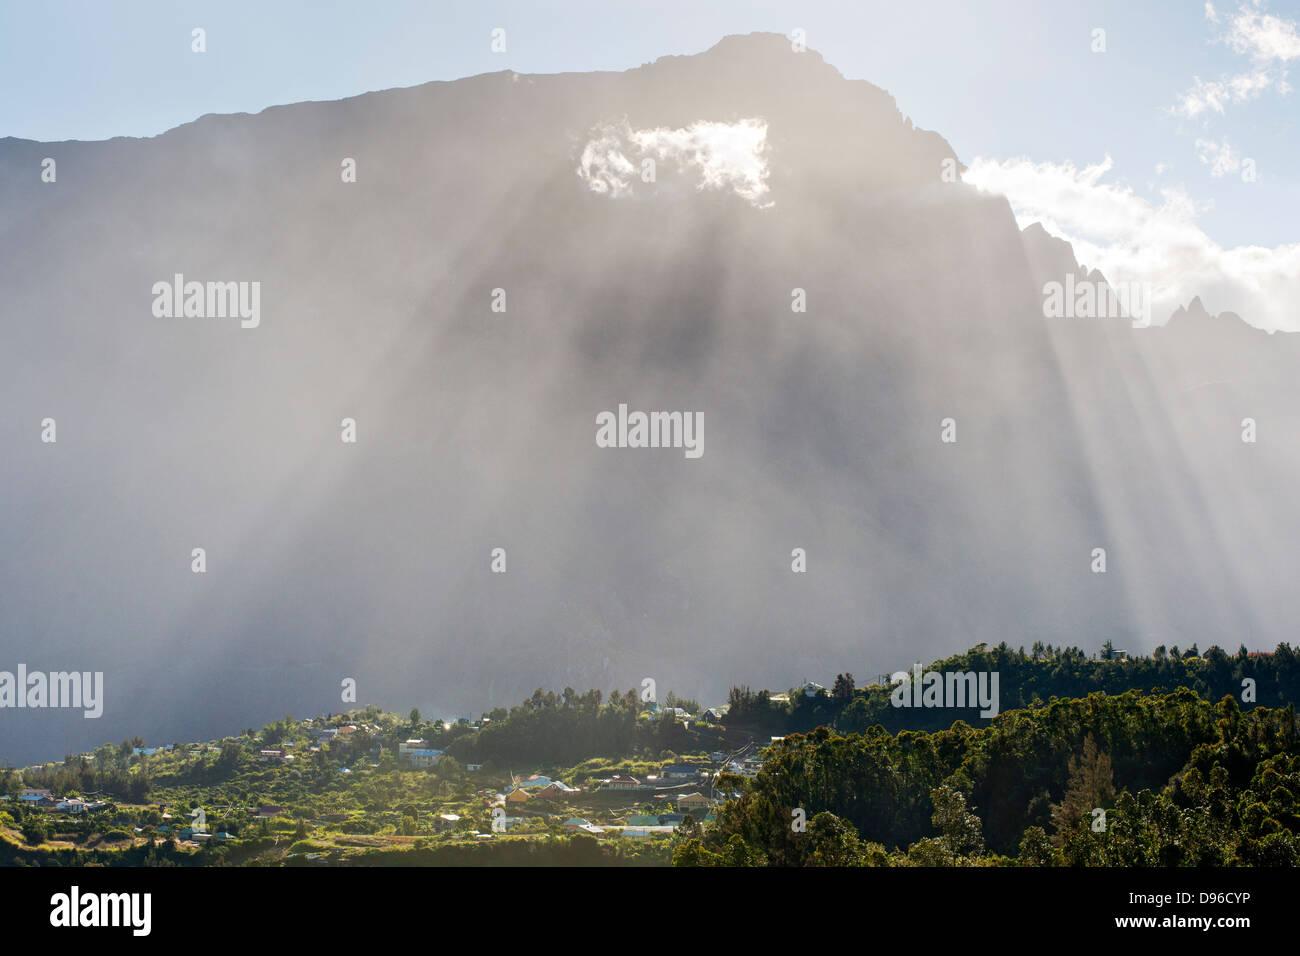 The village of Cilaos in the Cirque de Cilaos caldera on the French island of Reunion in the Indian Ocean. - Stock Image